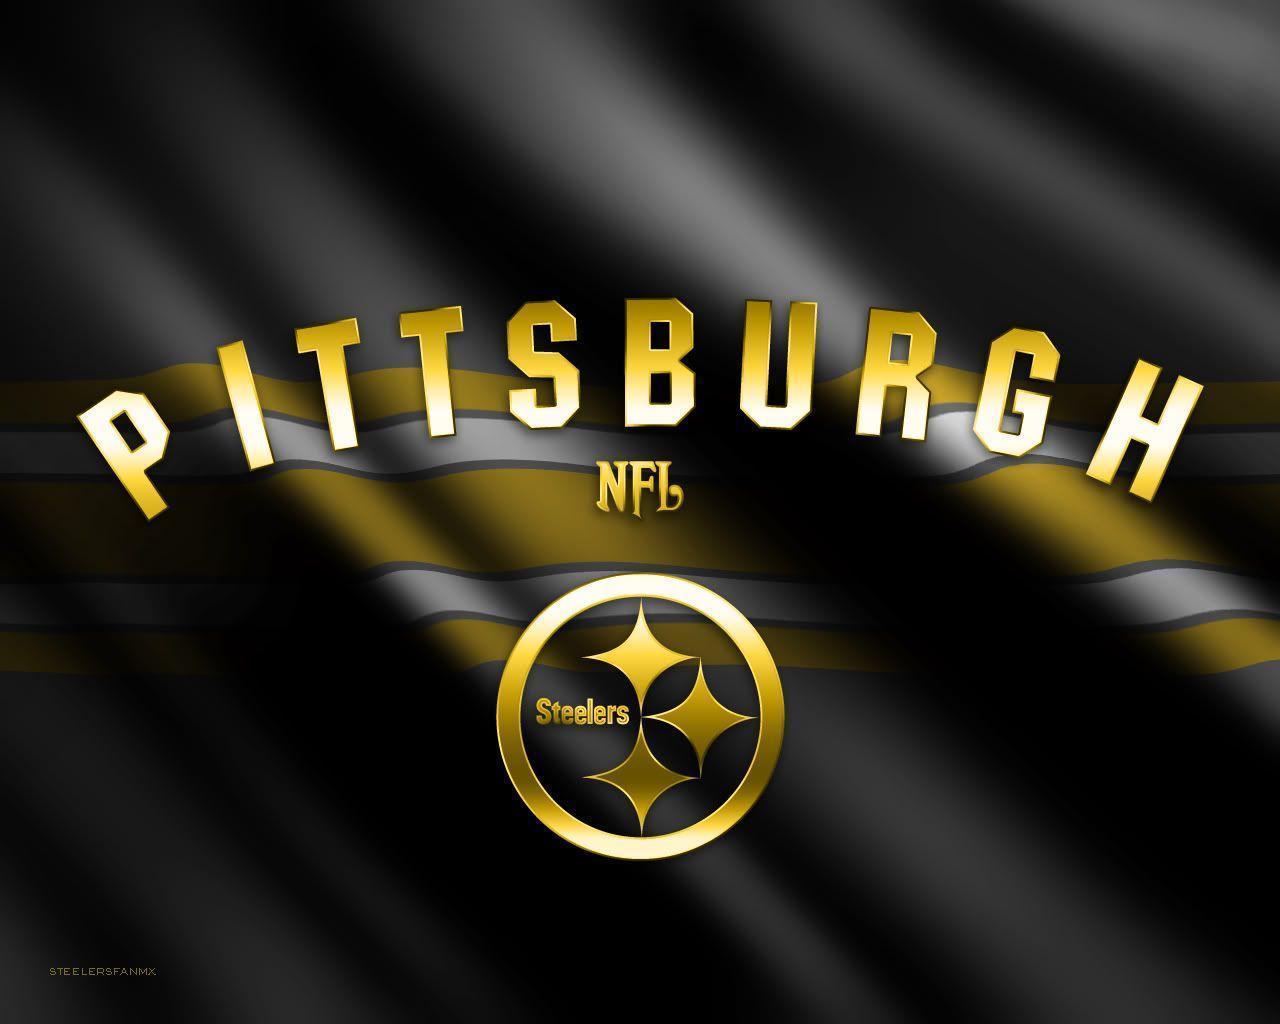 Steelers wallpaper | 1280x1024 | #54213